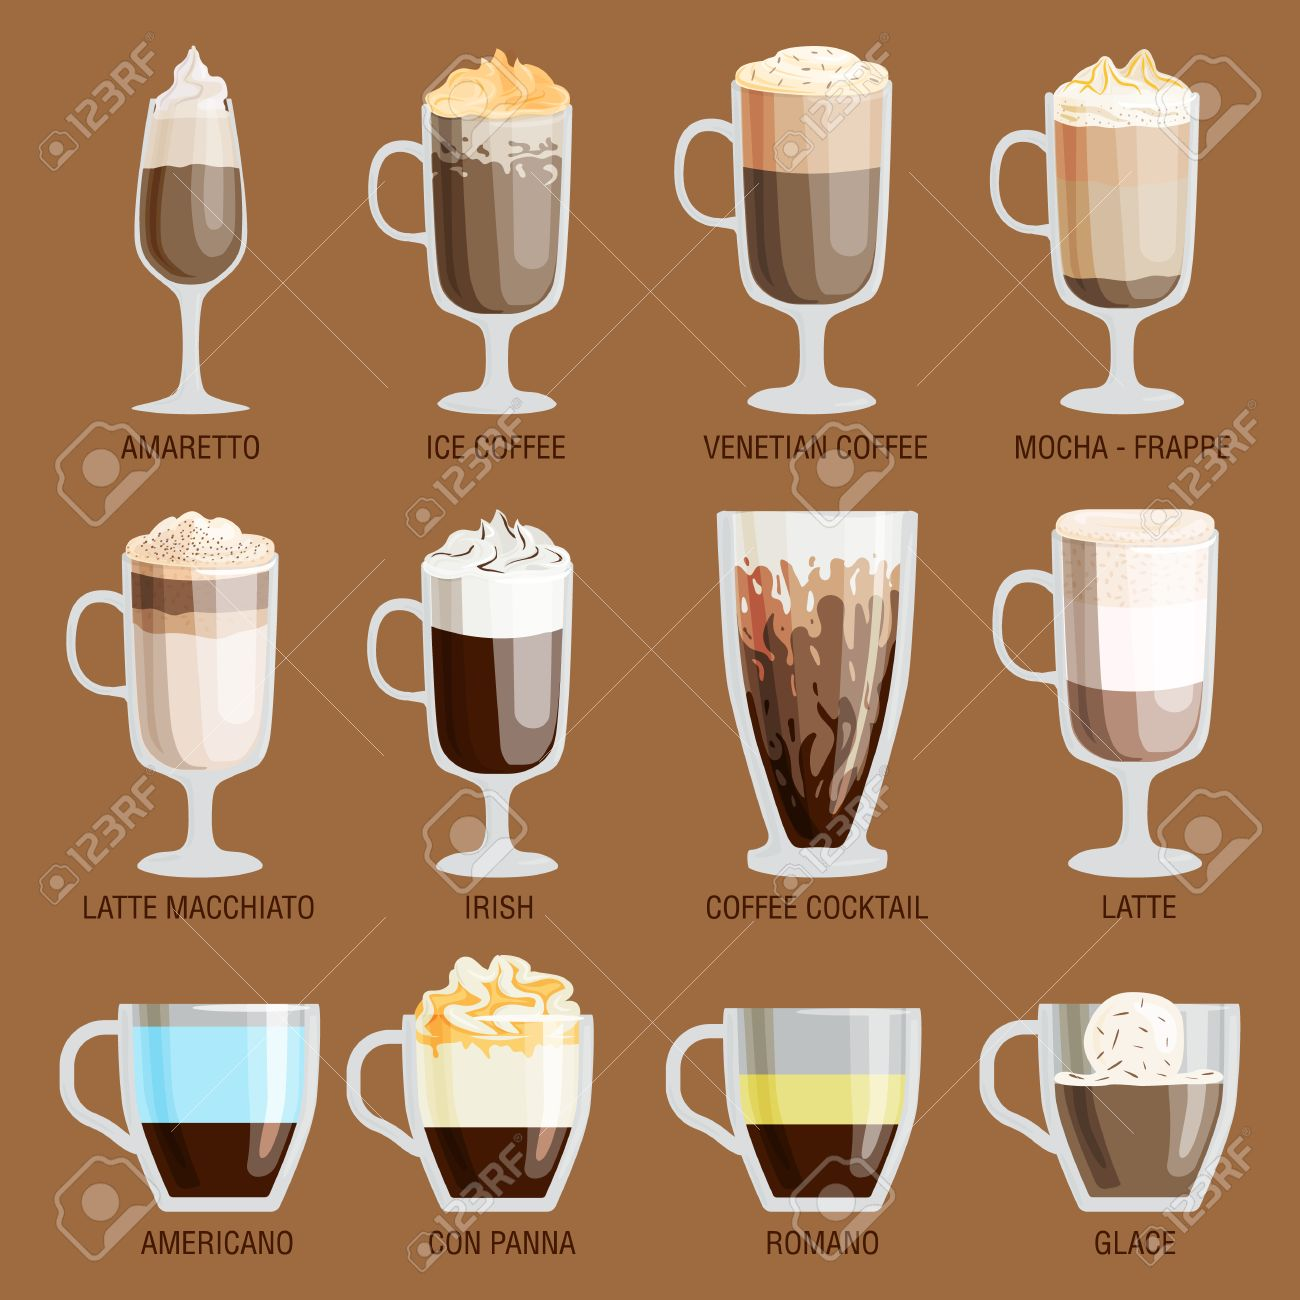 Cups Coffee Drinks With Espresso Foam Types Mug Different Cafe 4qSj3Rc5AL